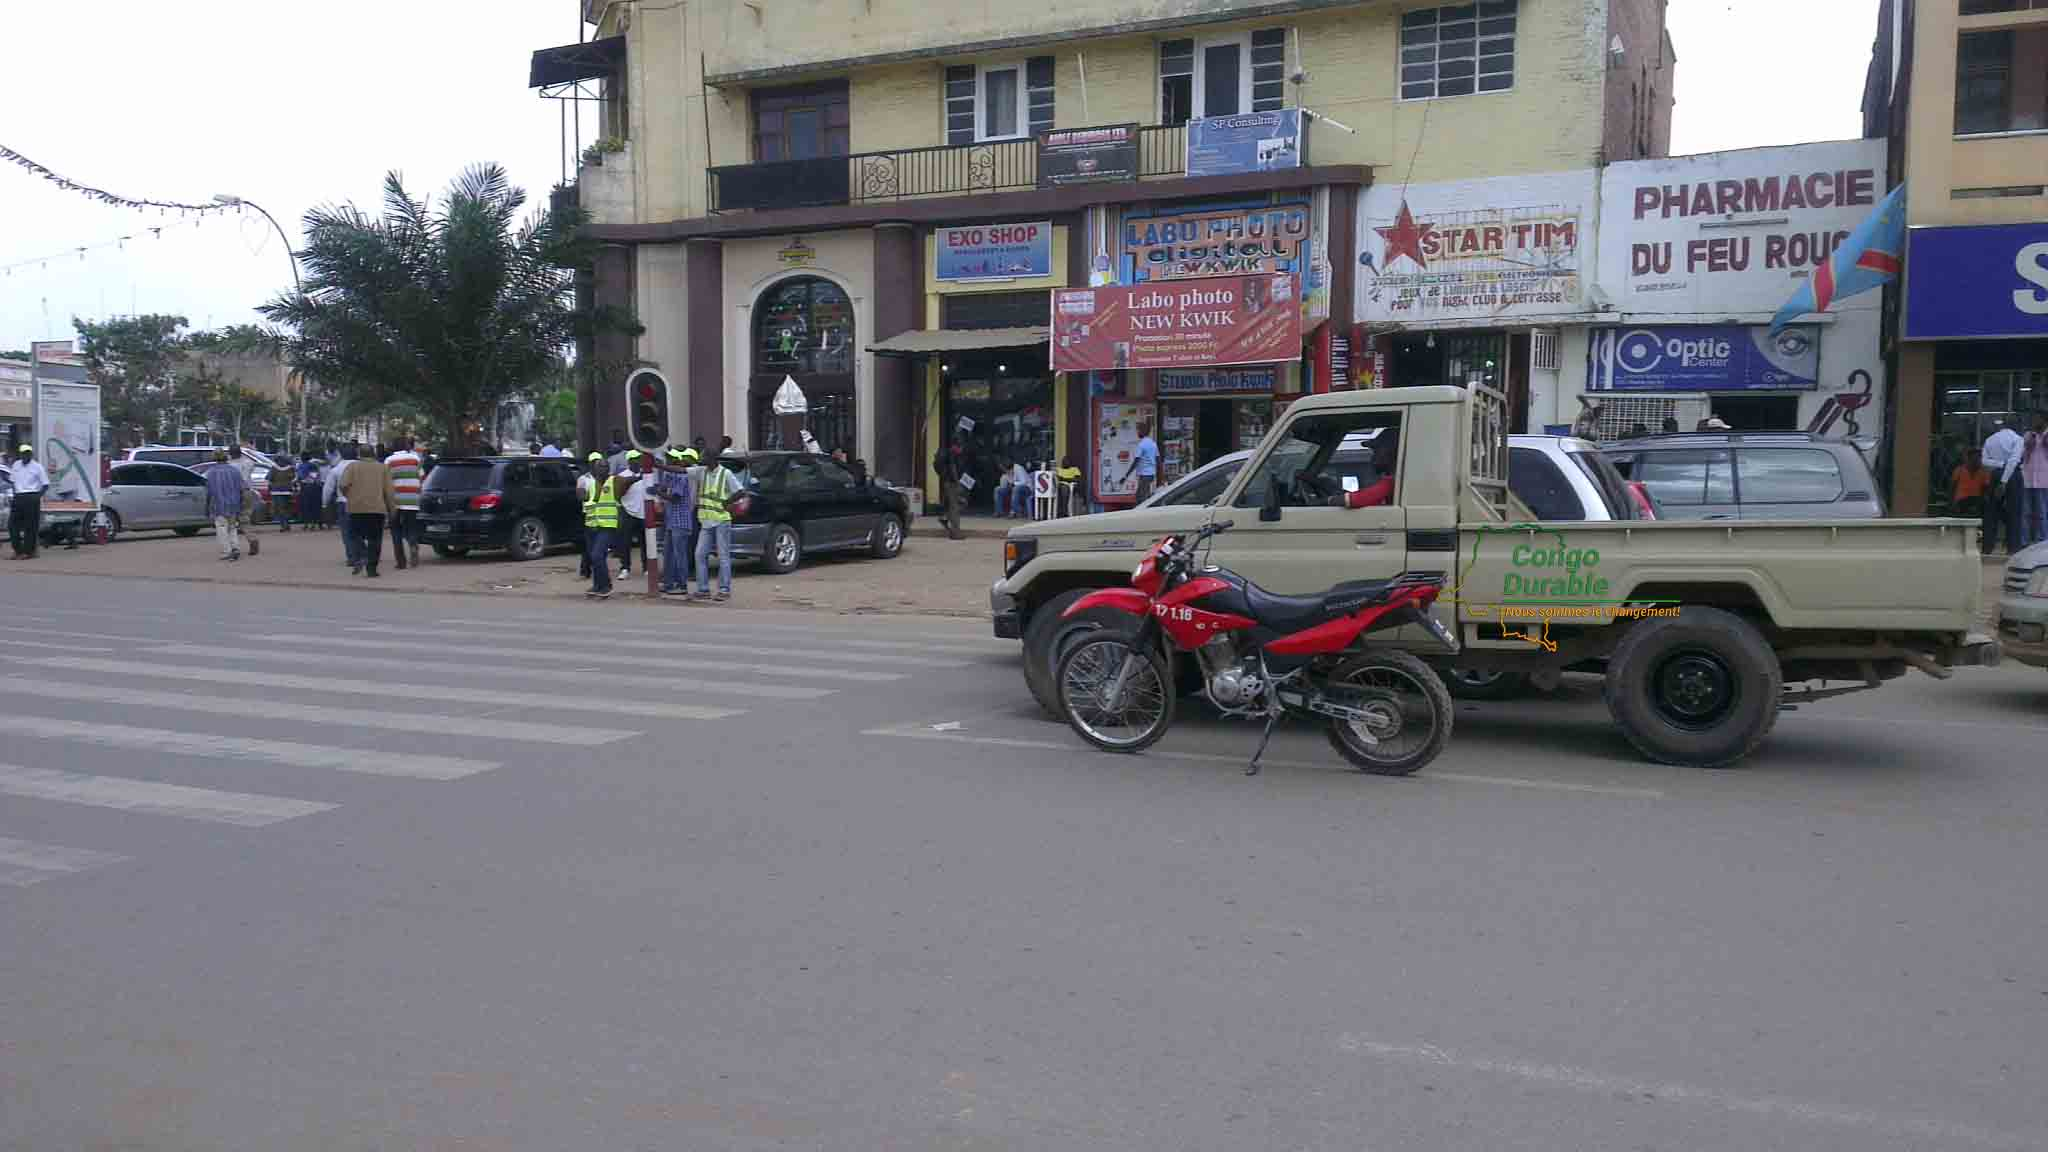 Taxis-motos, Lubumbashi